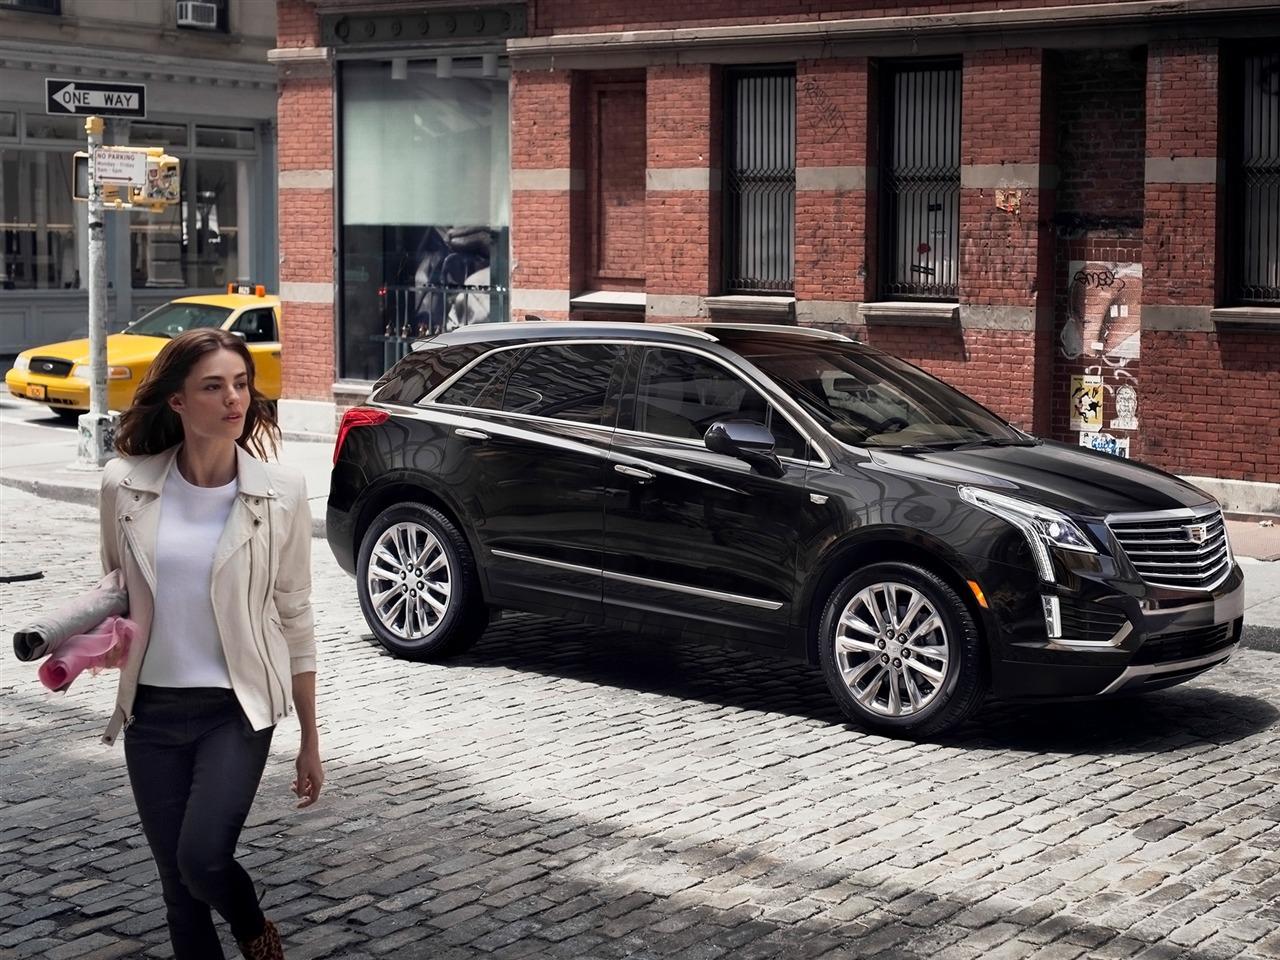 2014 Cadillac Escalade For Sale >> 2017 Cadillac 凯迪拉克XT5豪华SUV高清壁纸预览 | 10wallpaper.com